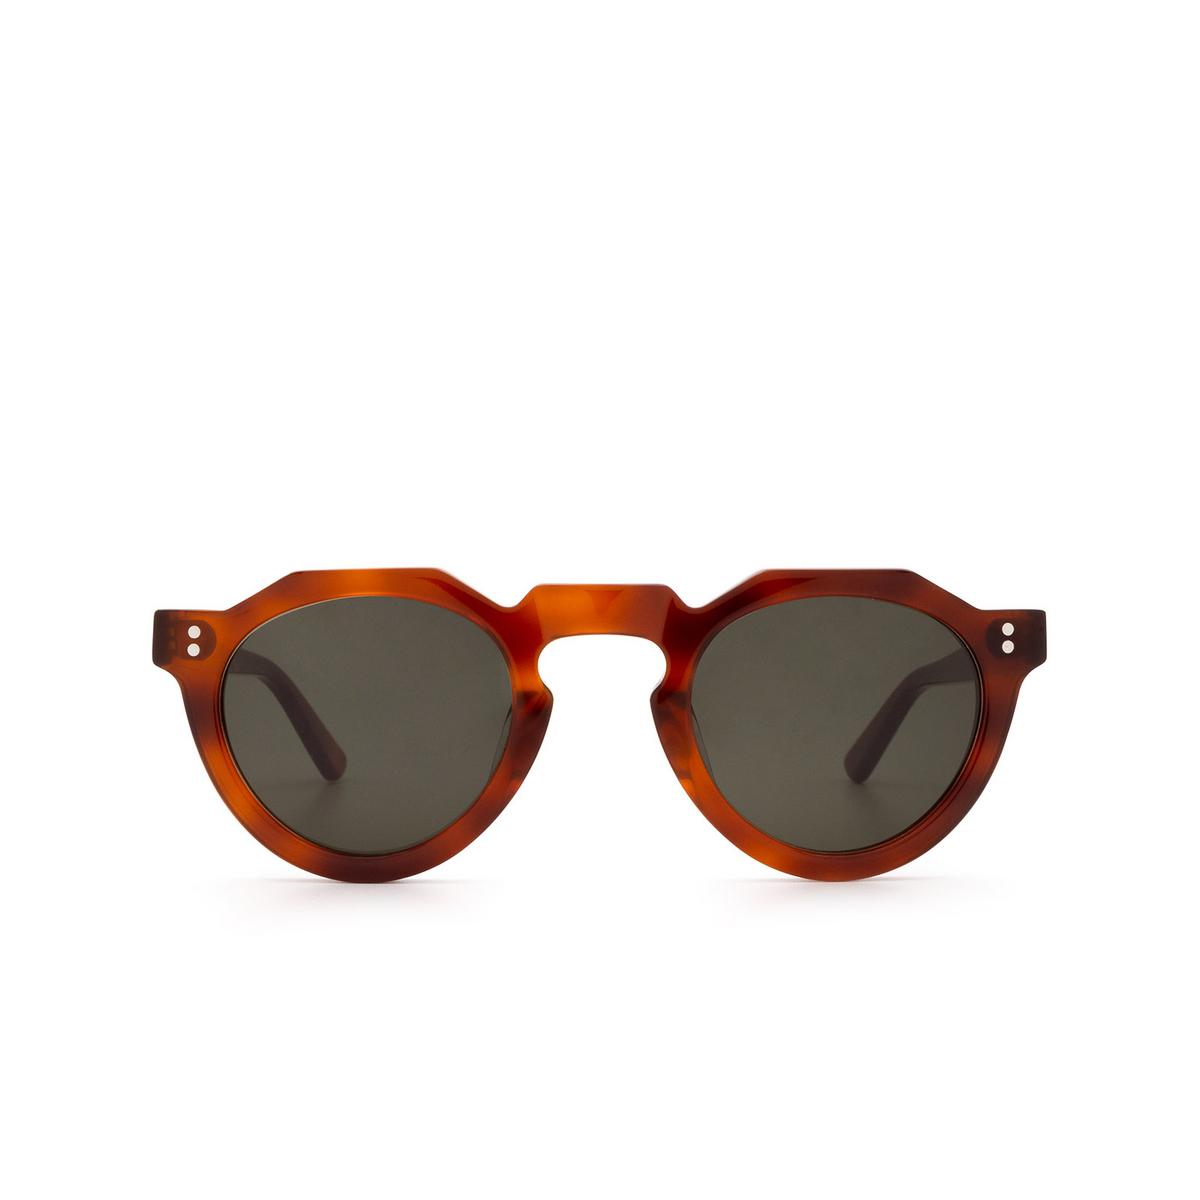 Lesca® Irregular Sunglasses: Pica Sun color Light Tortoise 53 - front view.